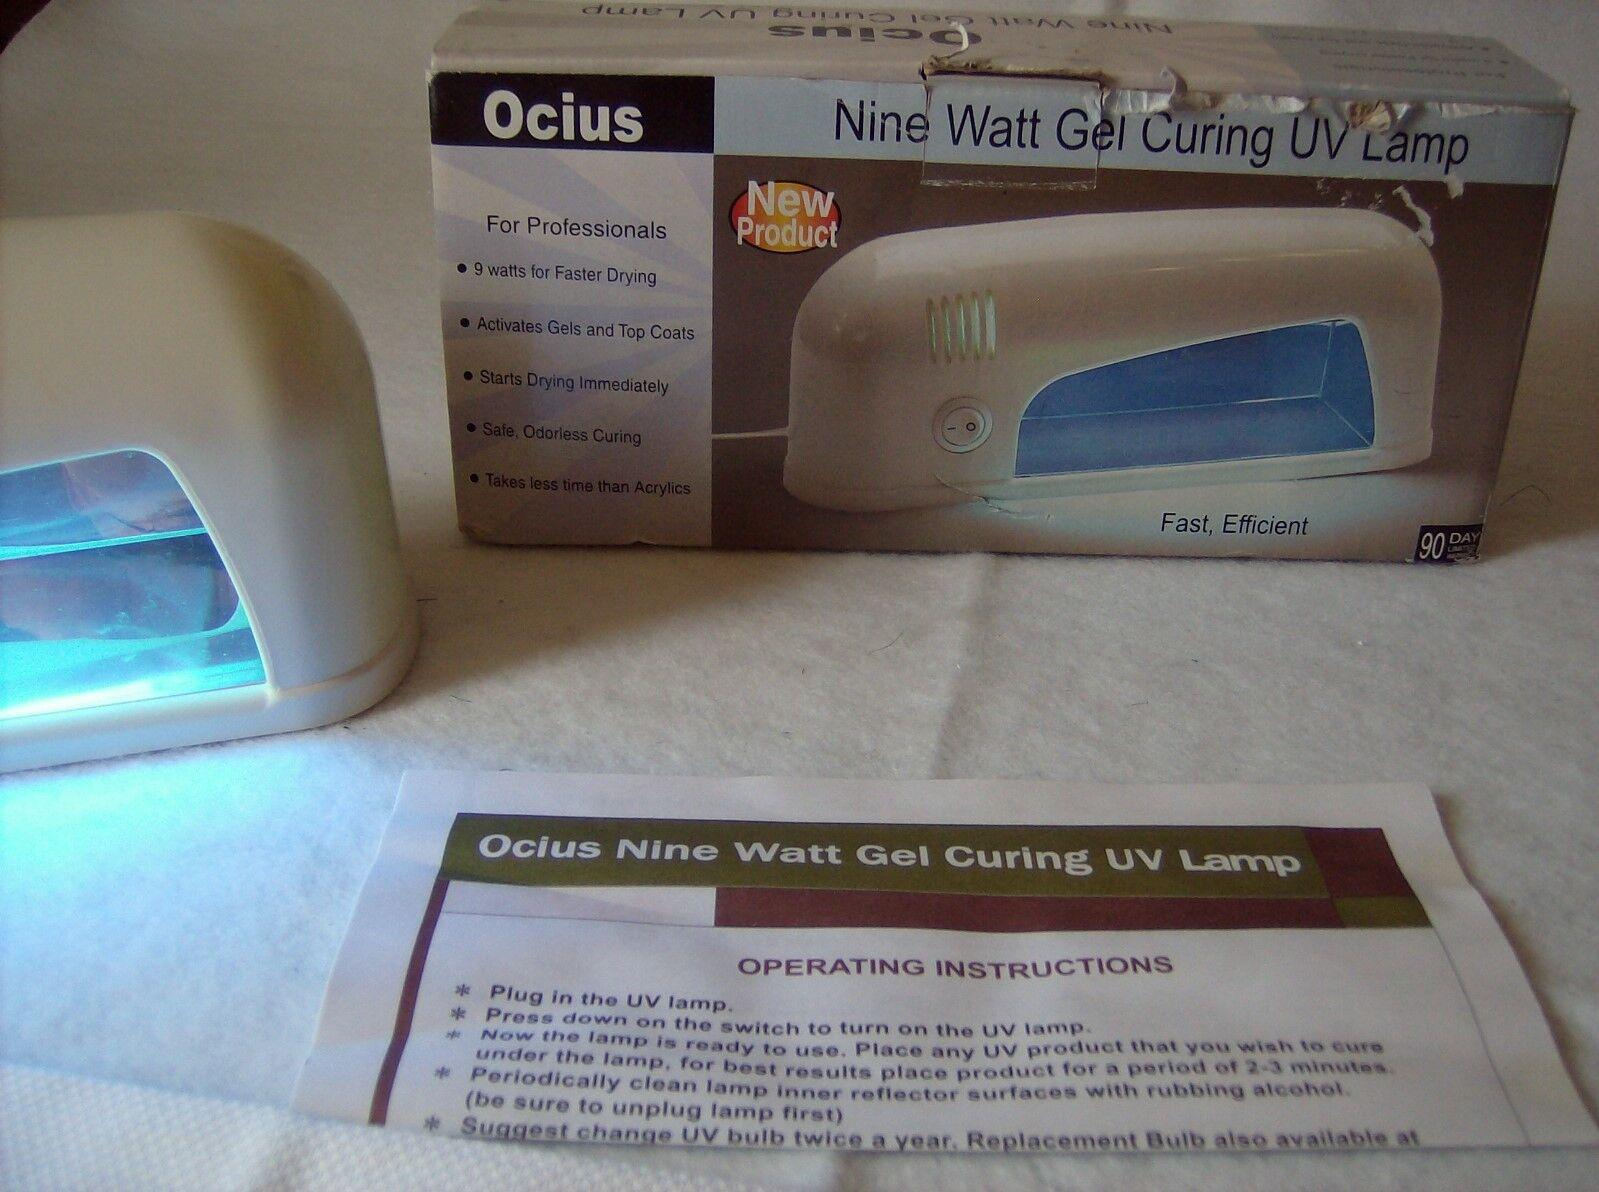 Ocius Nine Watt Gel Curing Uv Lamp Tiendamia Com